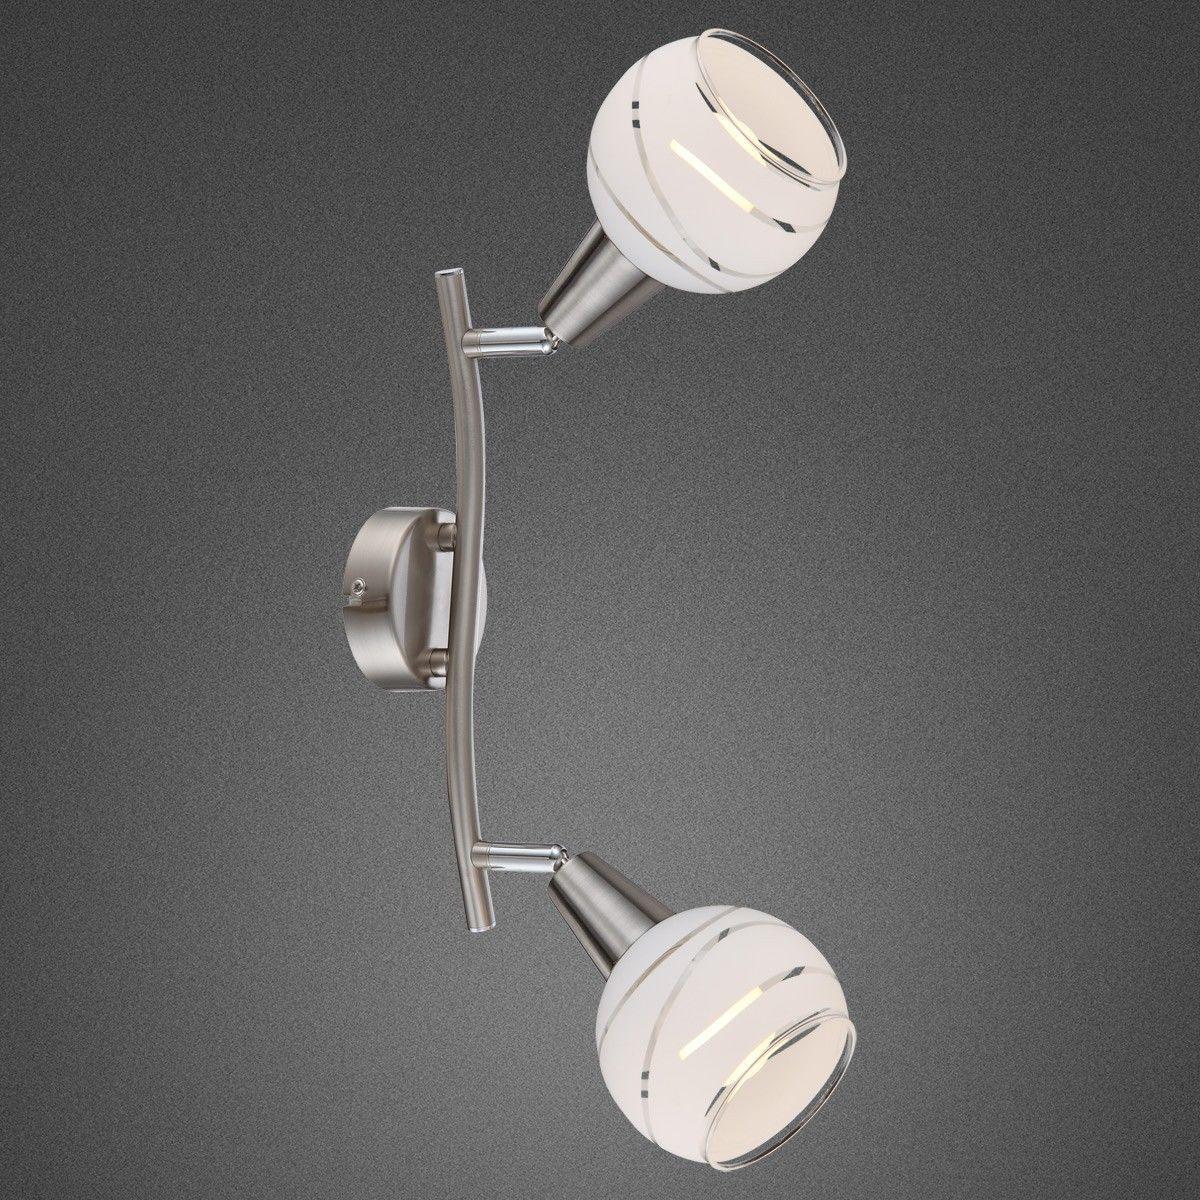 Globo kinkiet lampa ścienna Elliott 54341-2 nikiel mat LED 2x5W 3000K 28cm